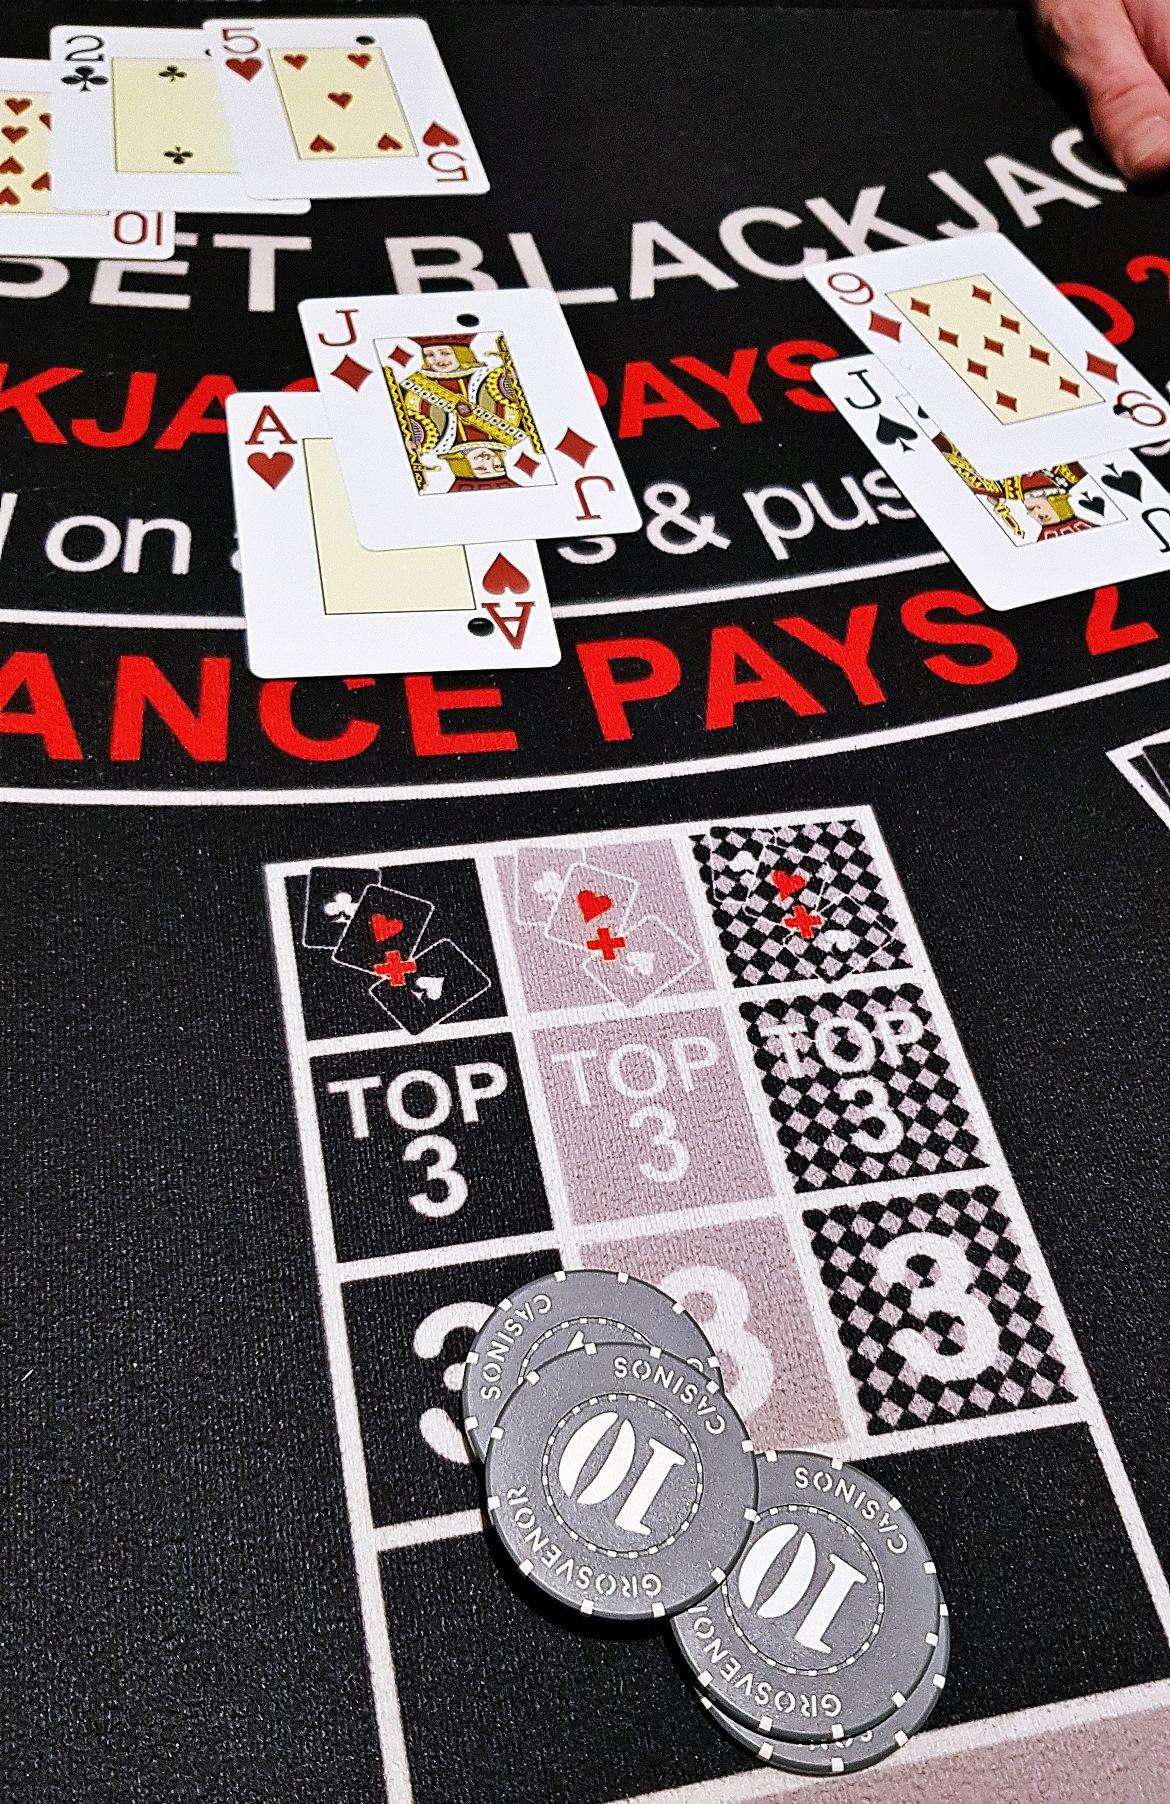 Blackjack - Grosvenor Casino Leeds review by BeckyBecky Blogs